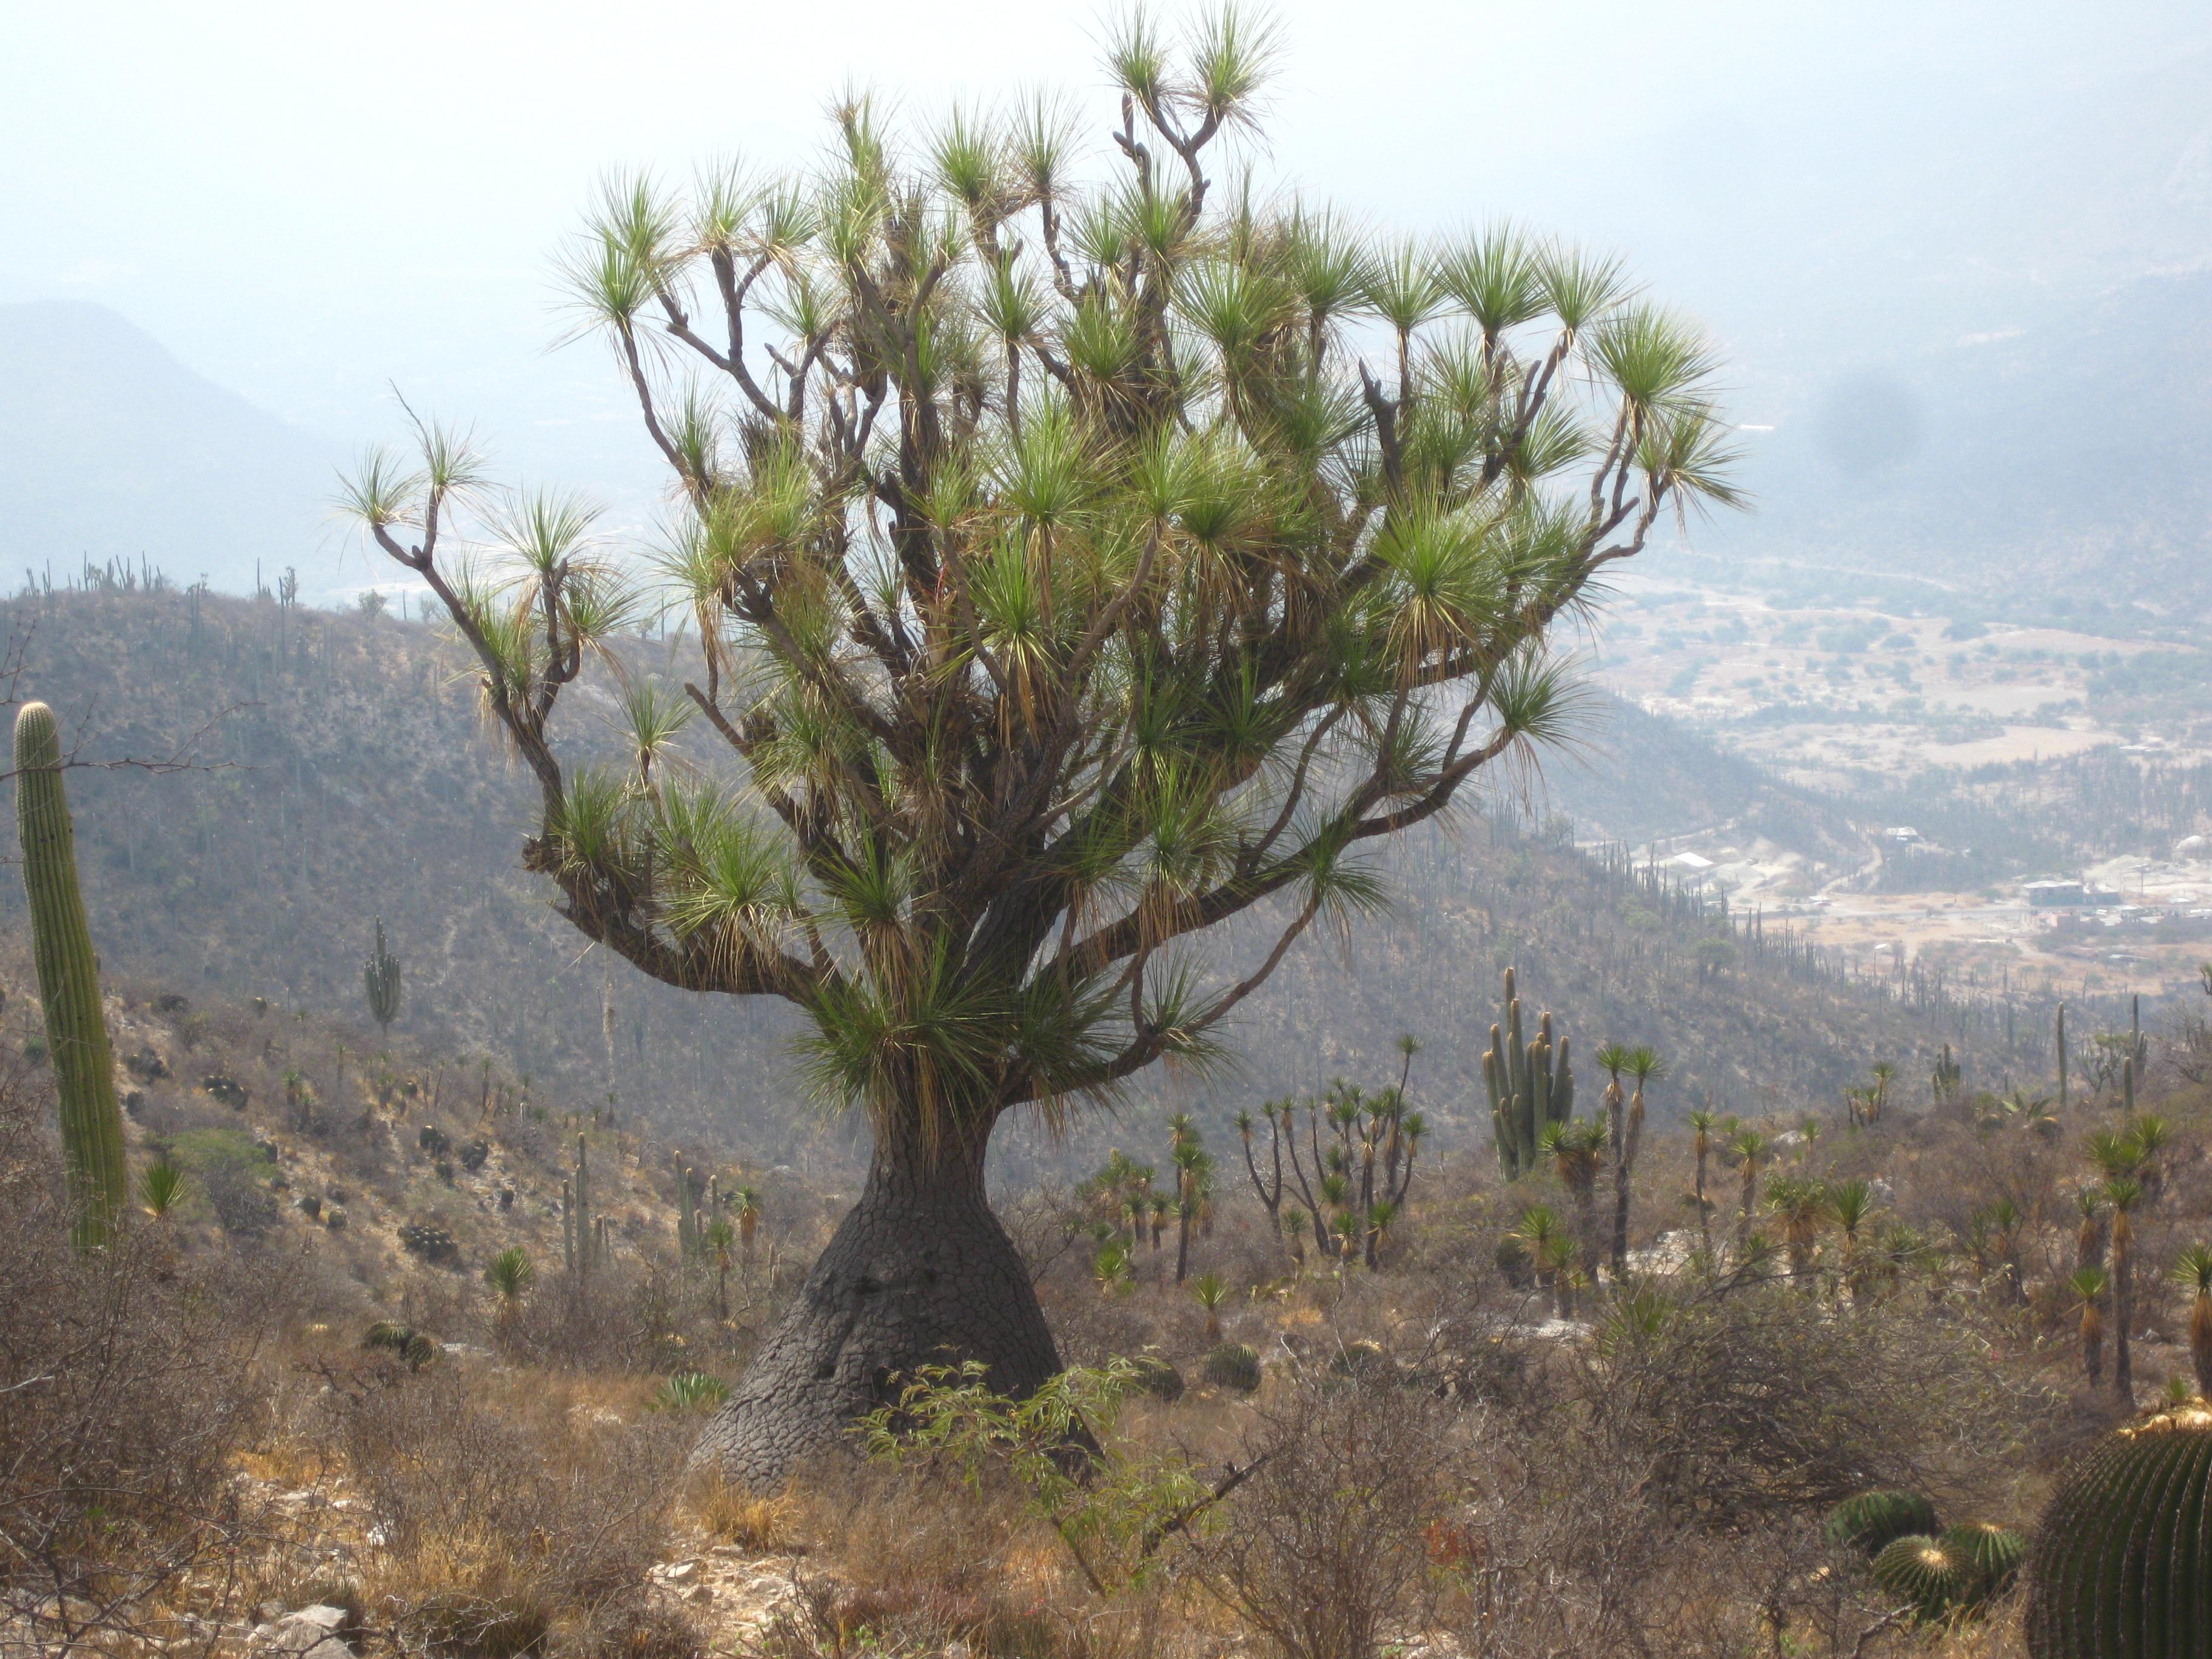 File:Beaucarnea gracilis Puebla.jpg - Wikimedia Commons